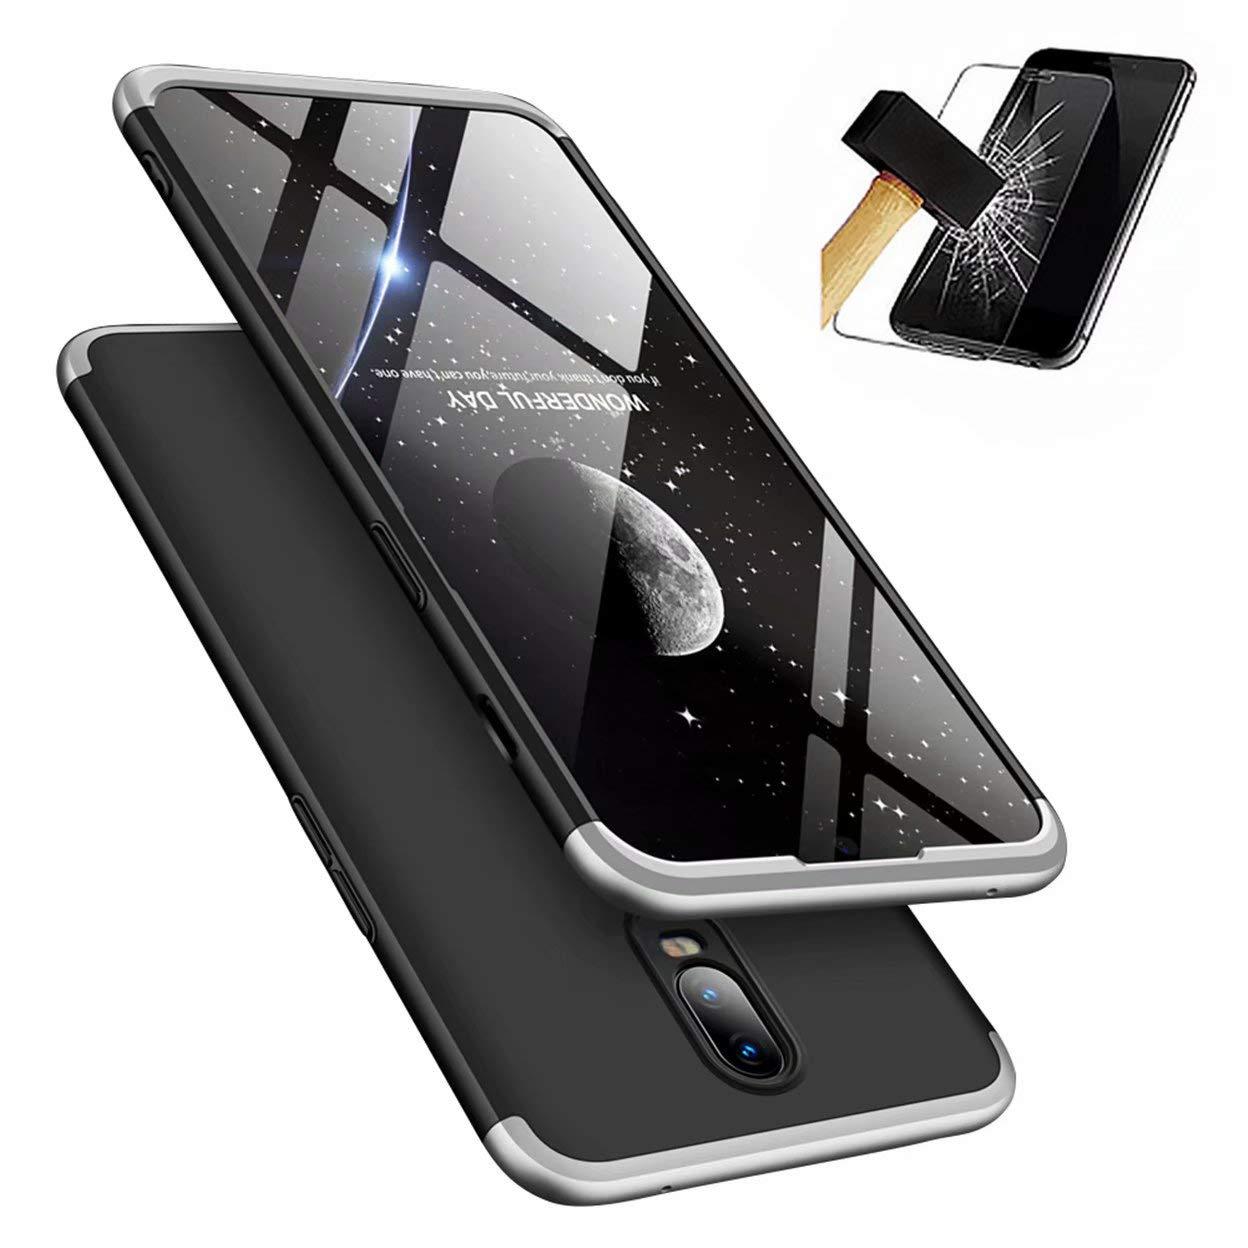 OnePlus 6Tケース、[スクリーンプロテクター] OnePlus 6T用超薄型バンパー付き1保護シェル付きLaixin 360°フルカバーPC 3(シルバー&ブラック)   B07L5Q6T5H